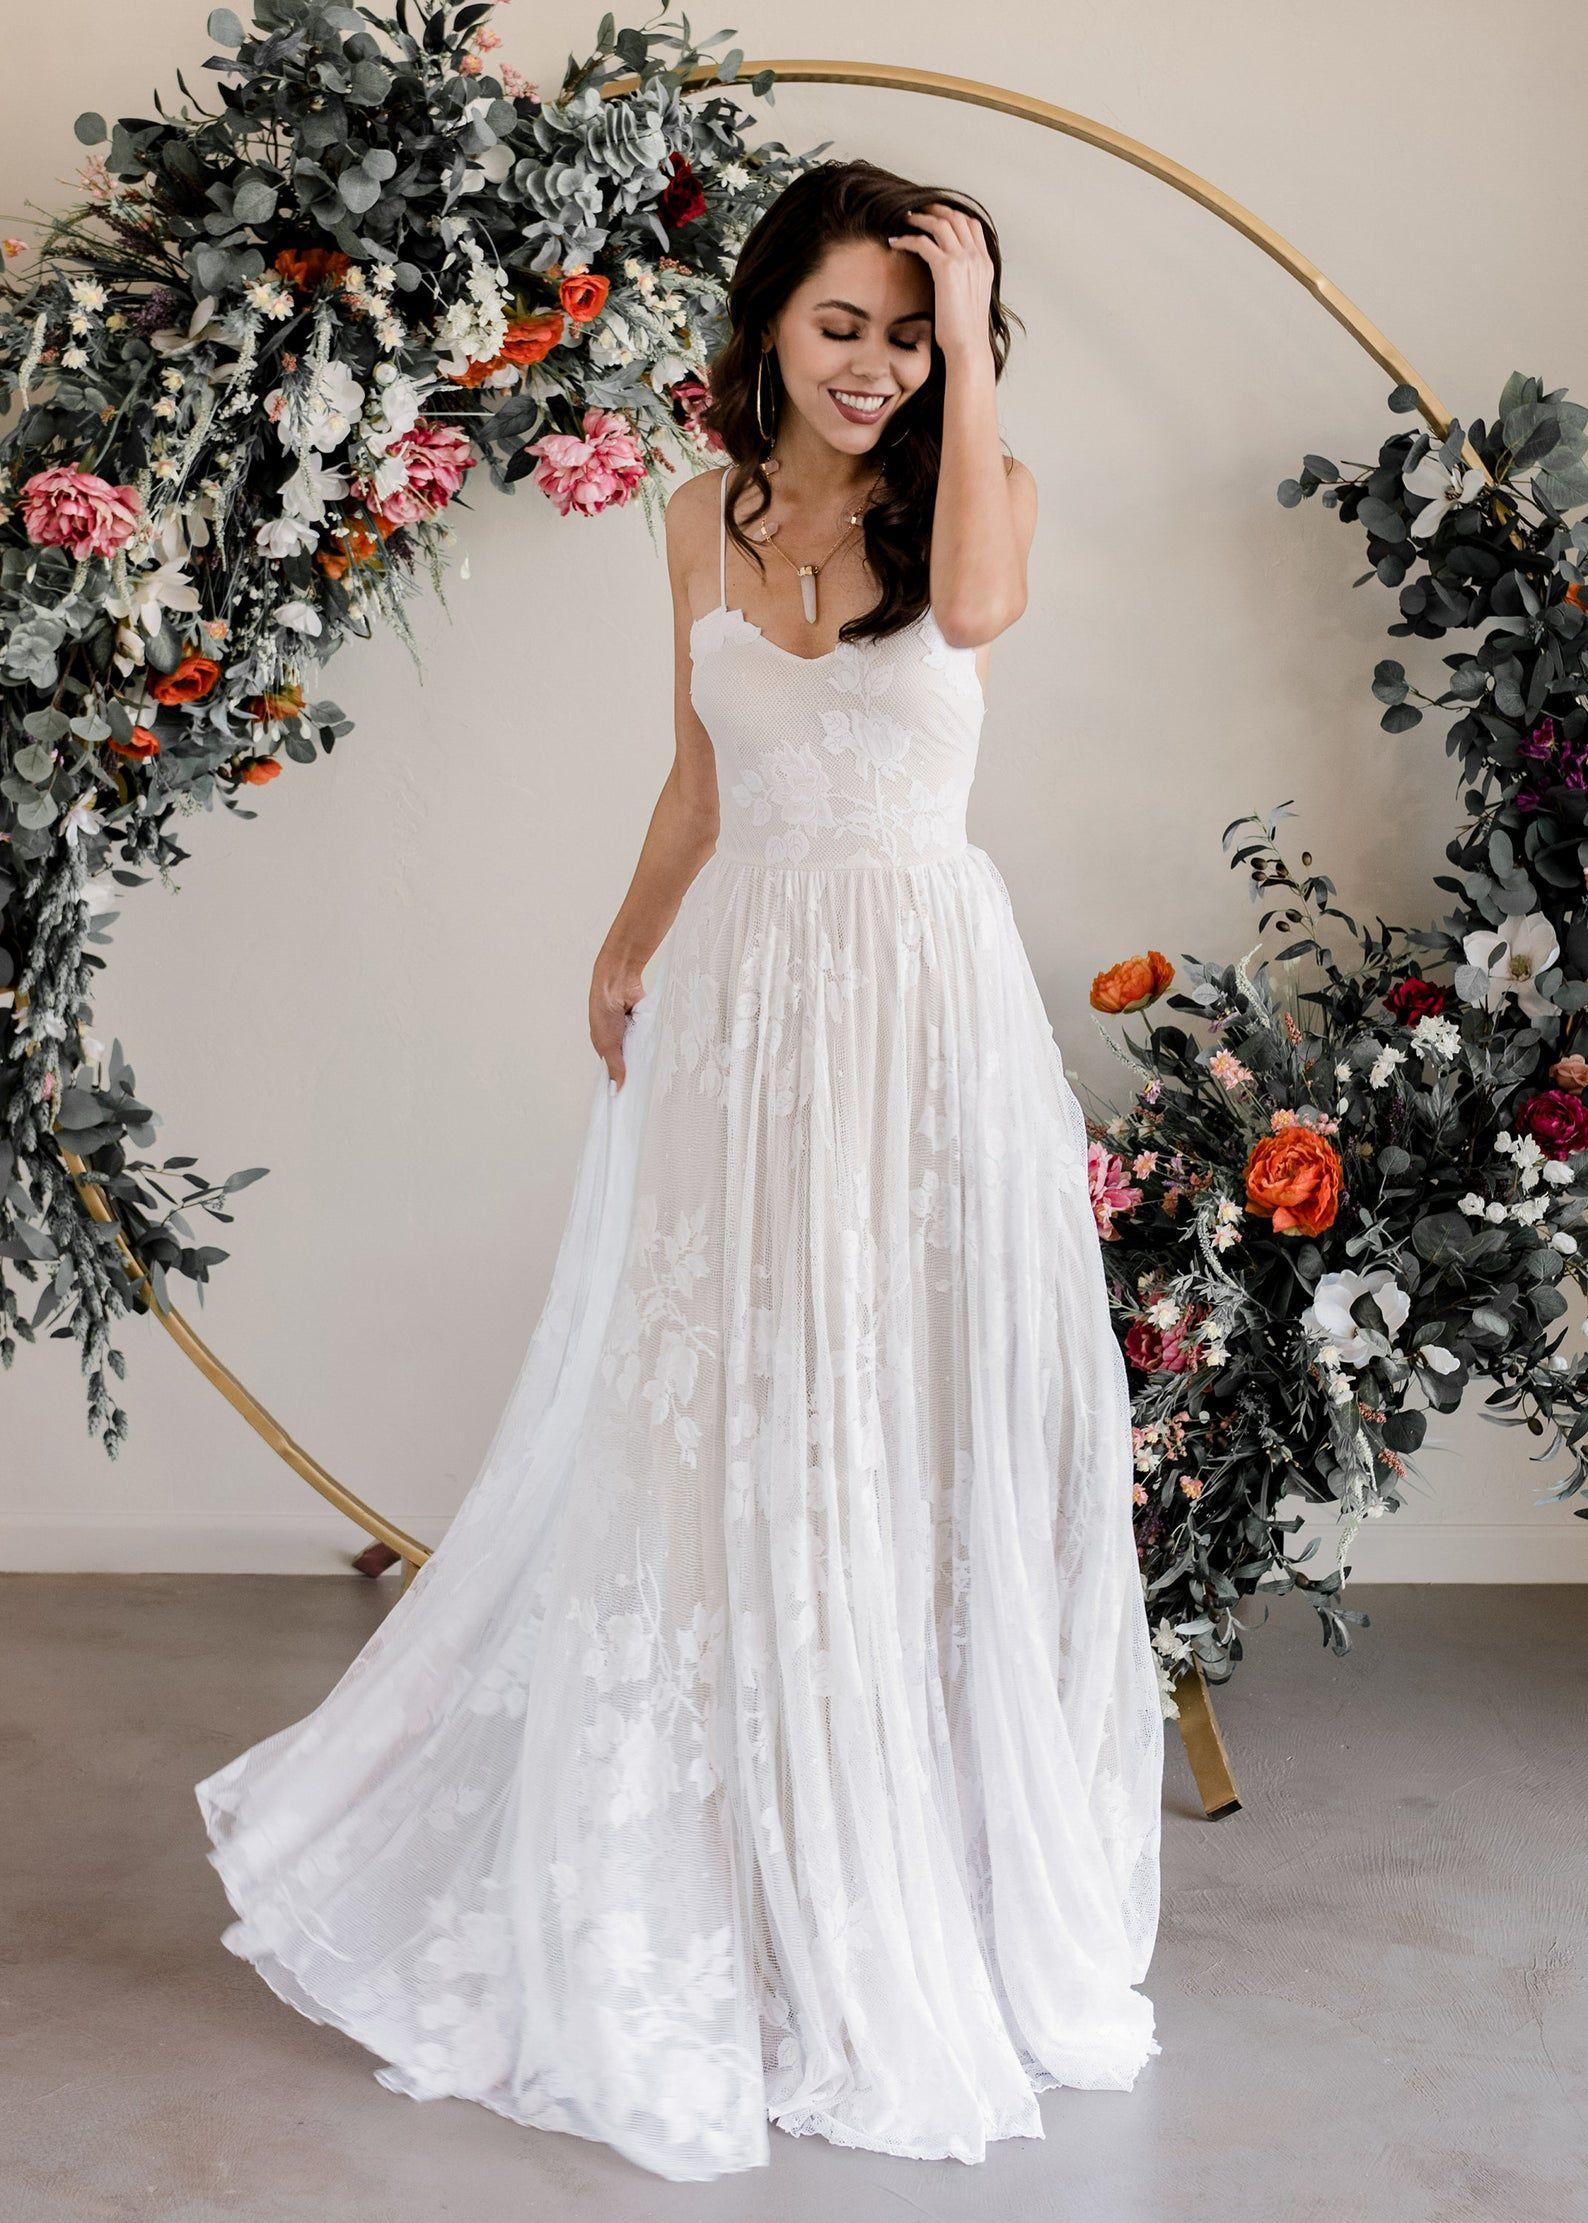 Lace Wedding Dress, Boho Wedding Dress, Beach Wedding